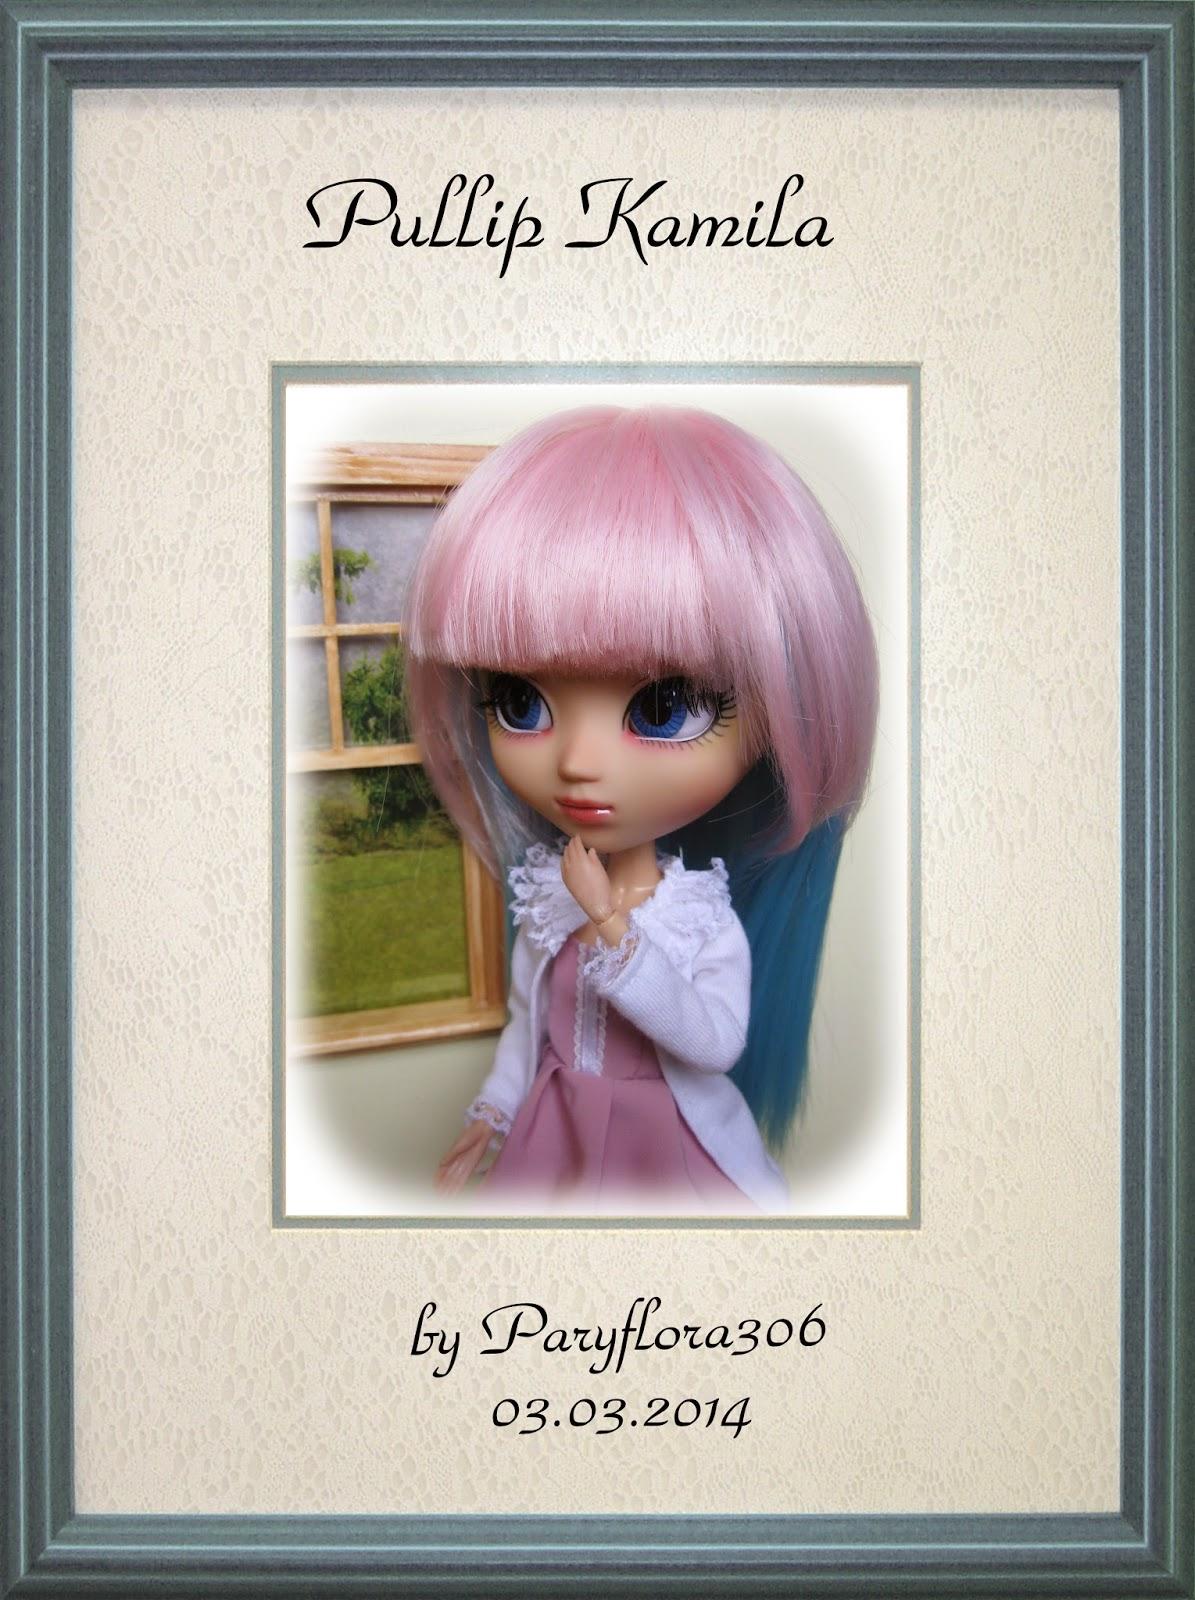 http://pariflora.blogspot.com/2014/04/pullip-kamila-sprzedana.html